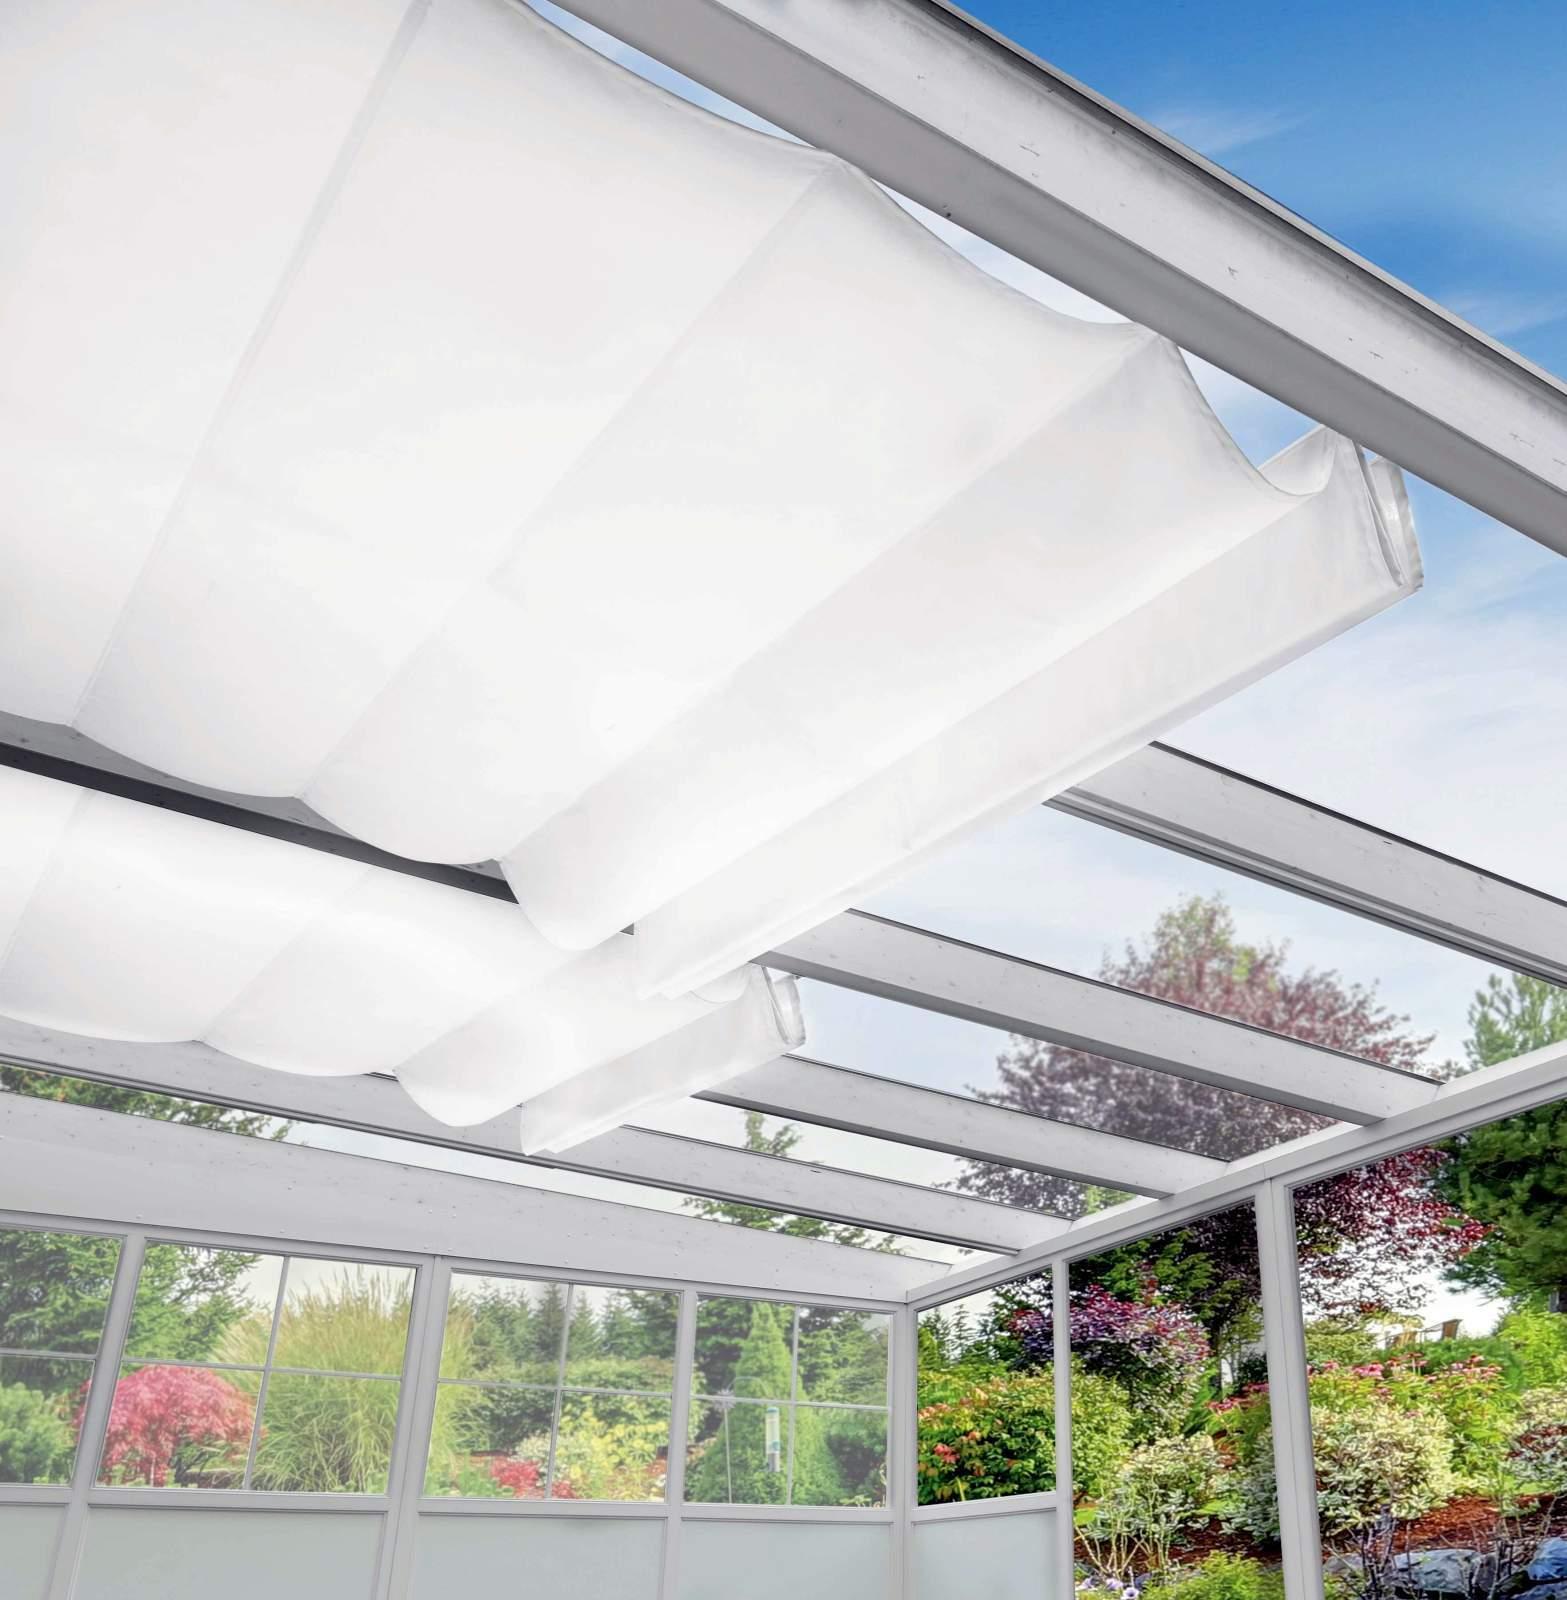 Terrassendach Alu 16 mm Stegplatten+Beschattung Sunola® Terrassenüberdachung 4 m